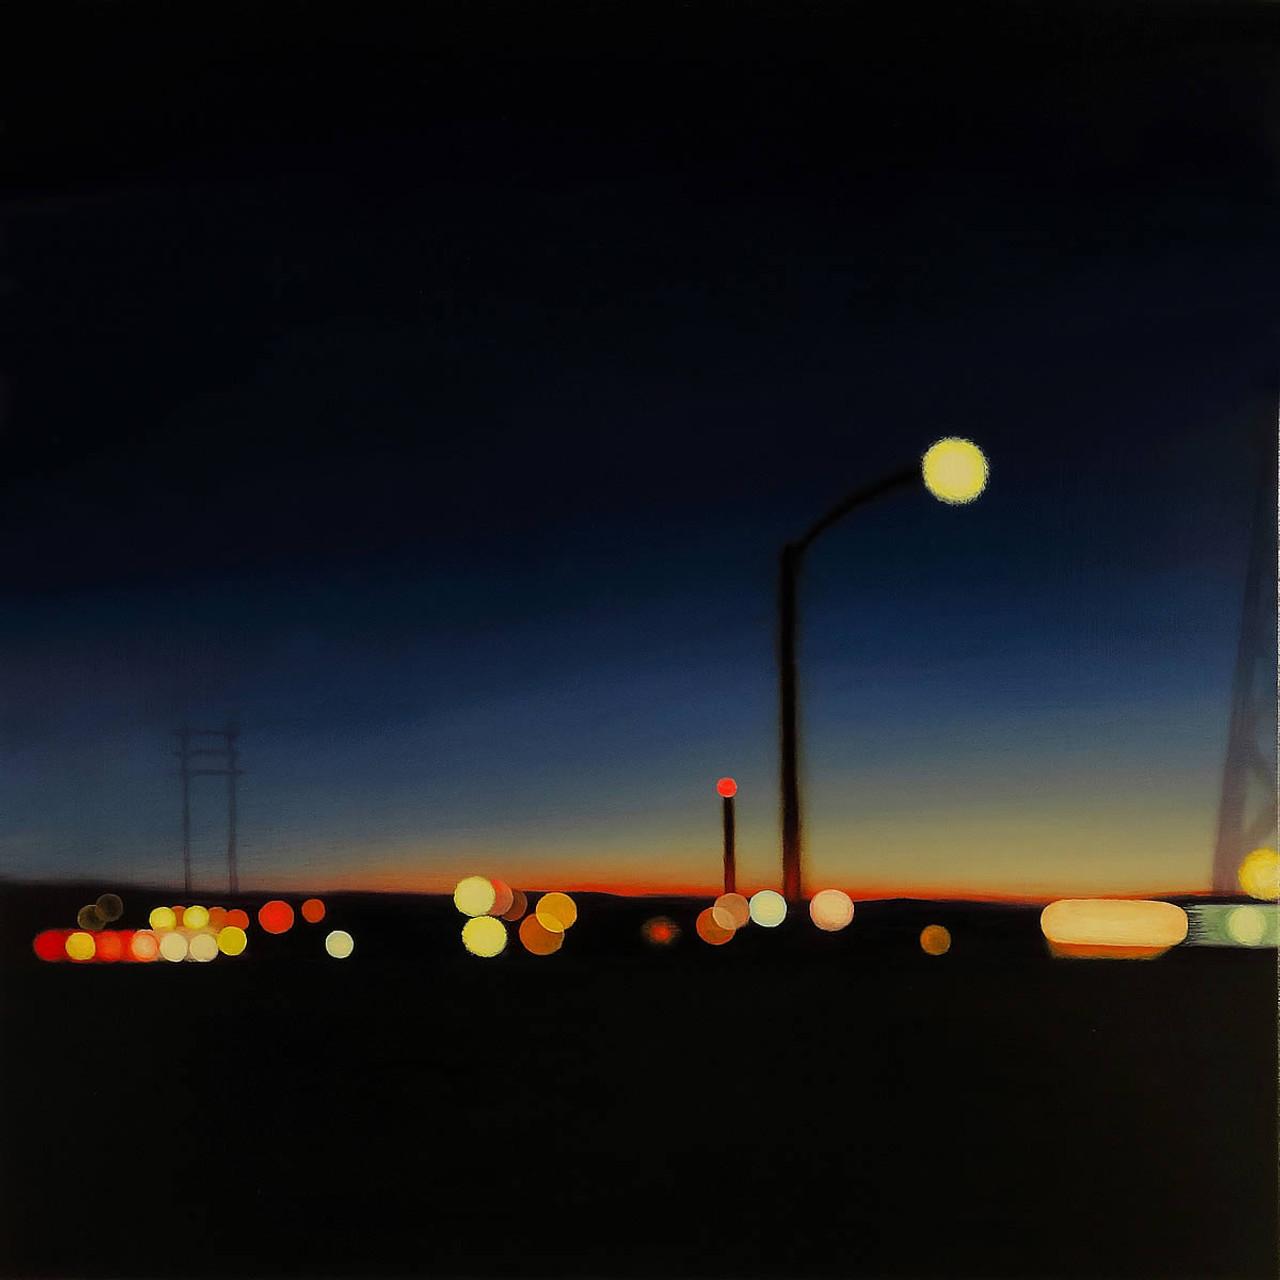 Freeway Blur